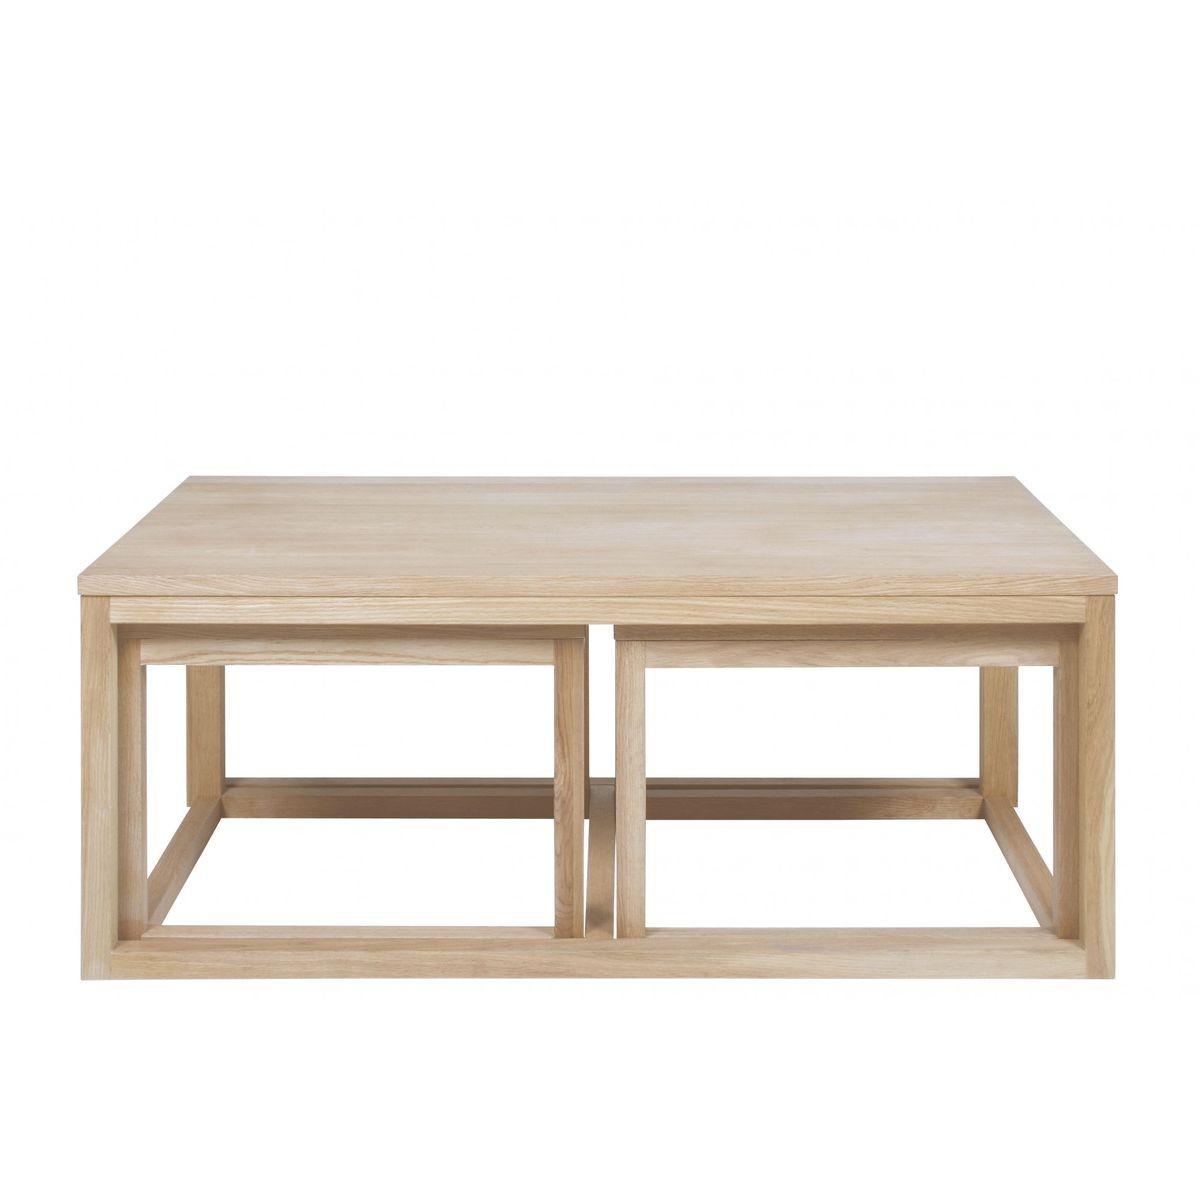 Table Basse Corner En Chene Taille Taille Unique Products Table Basse Table Basse Gigogne Et Table Basse Chene